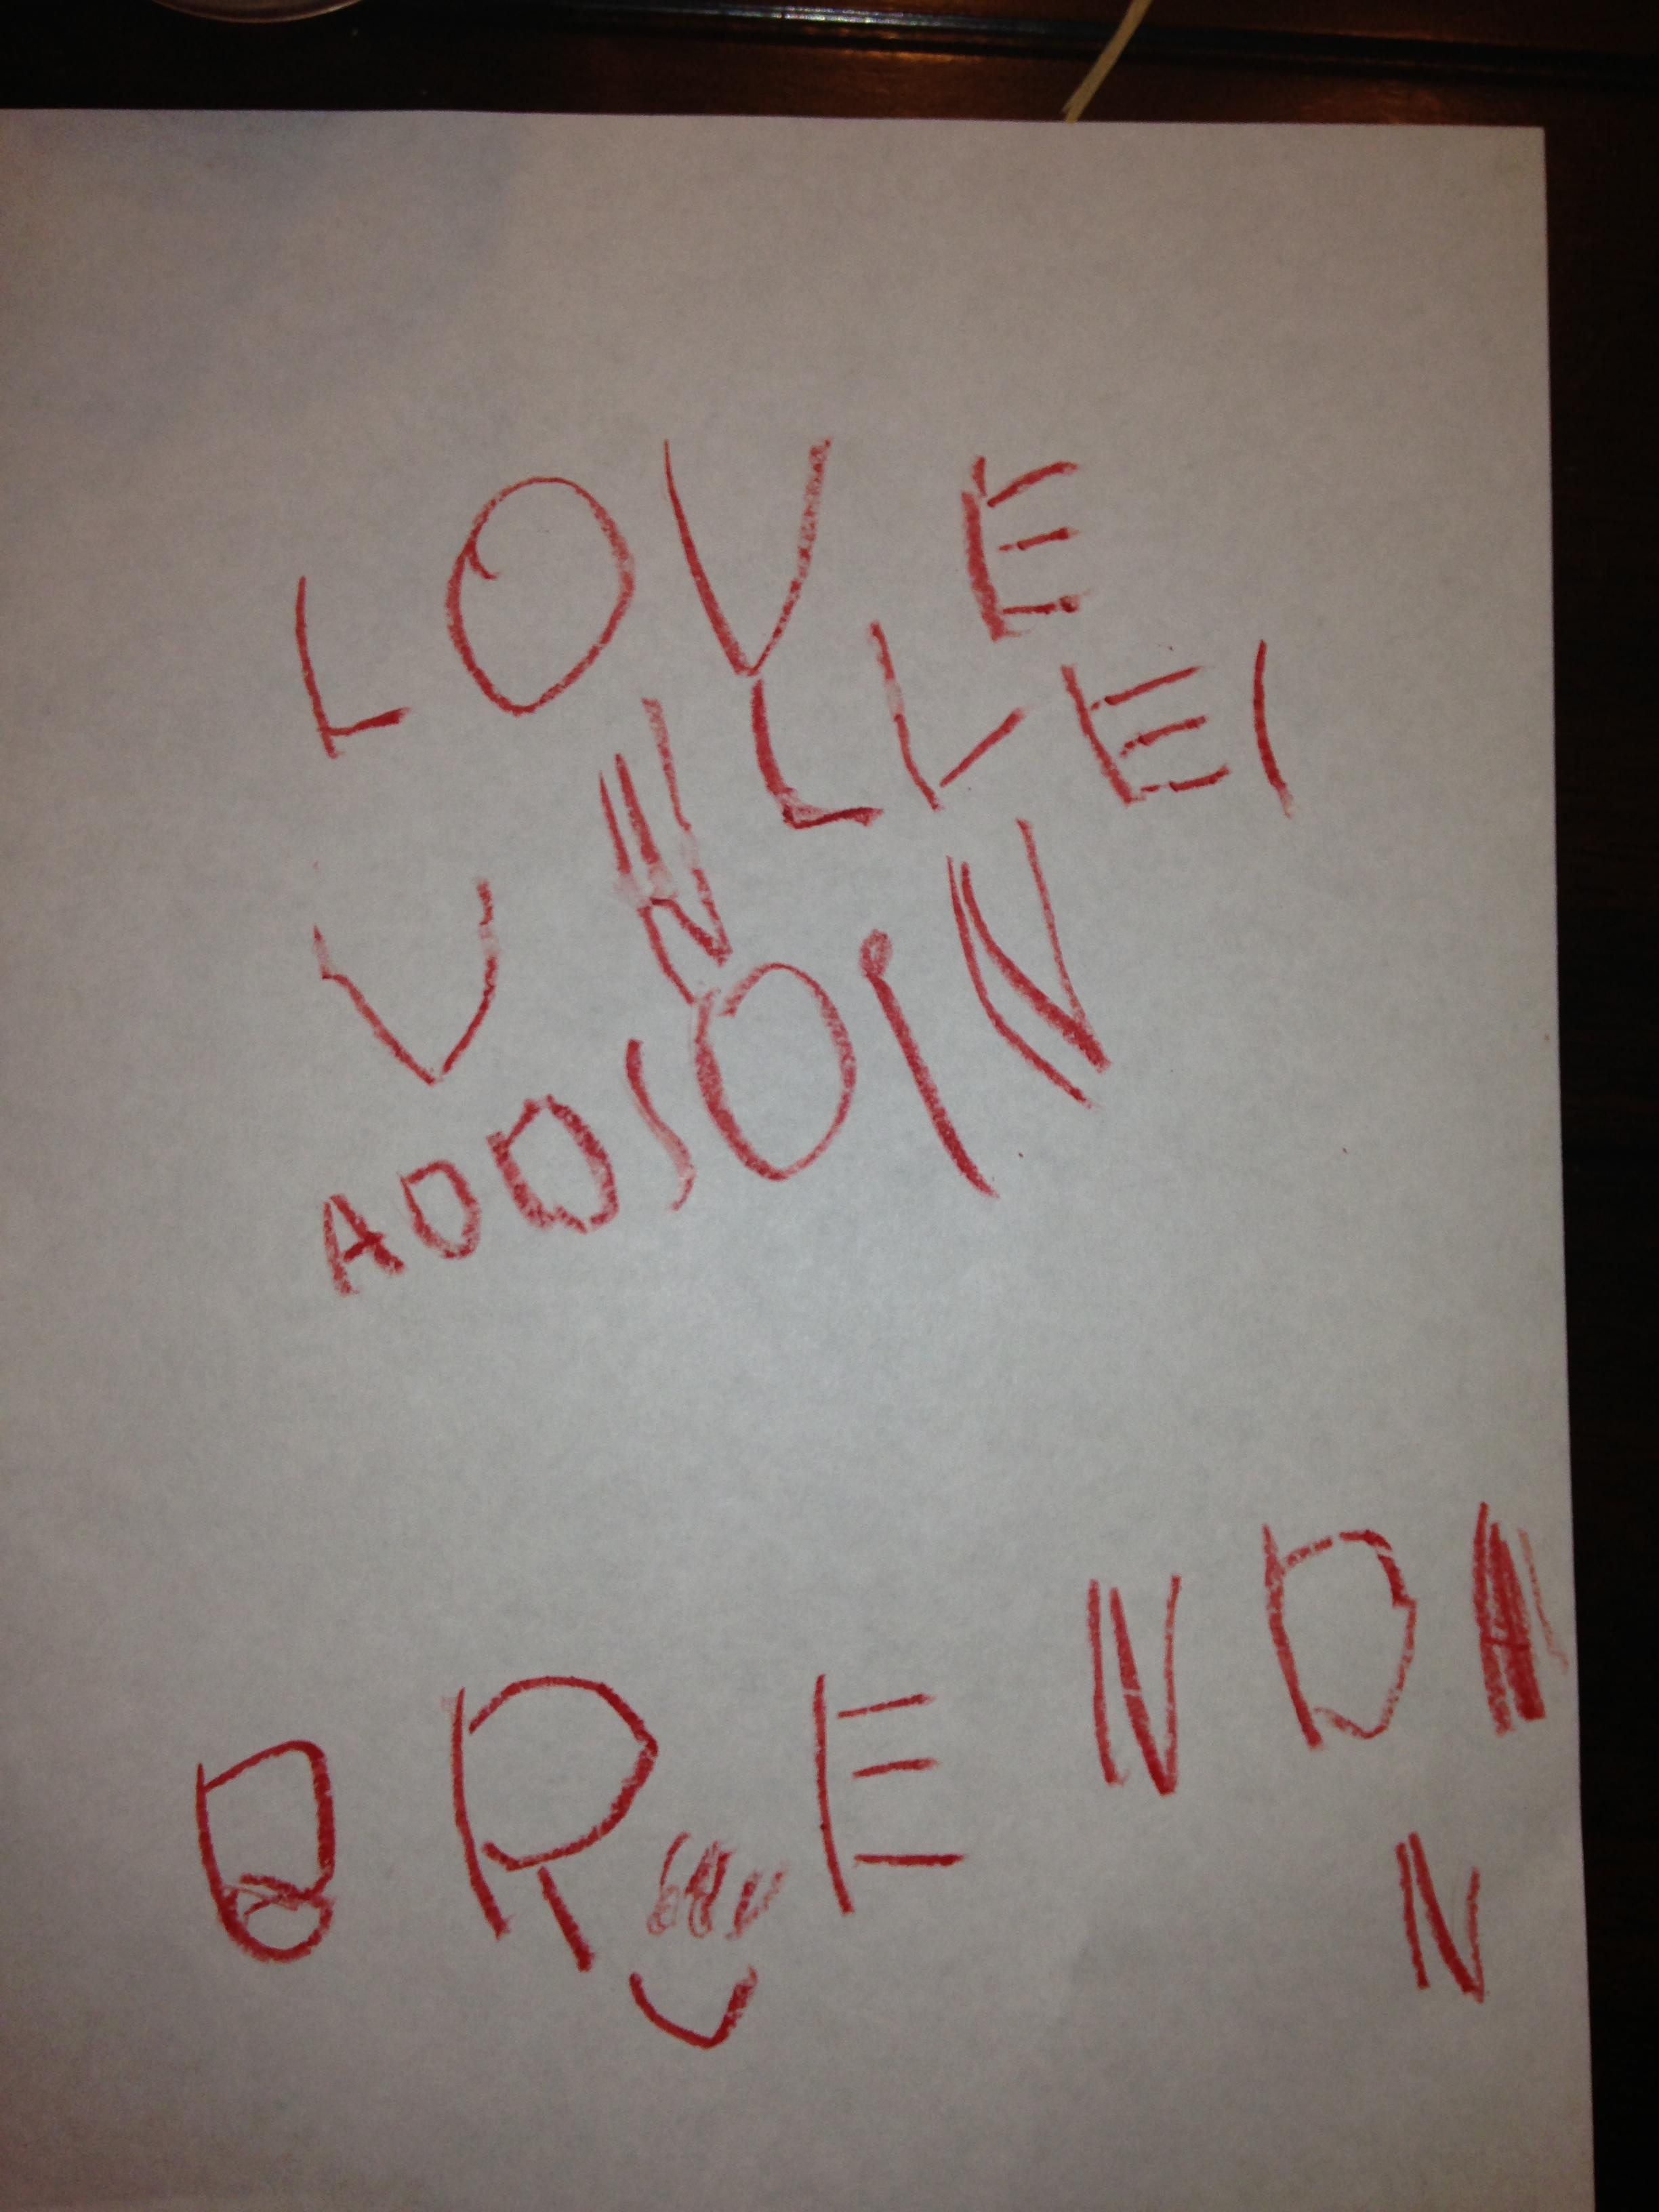 Addi's note